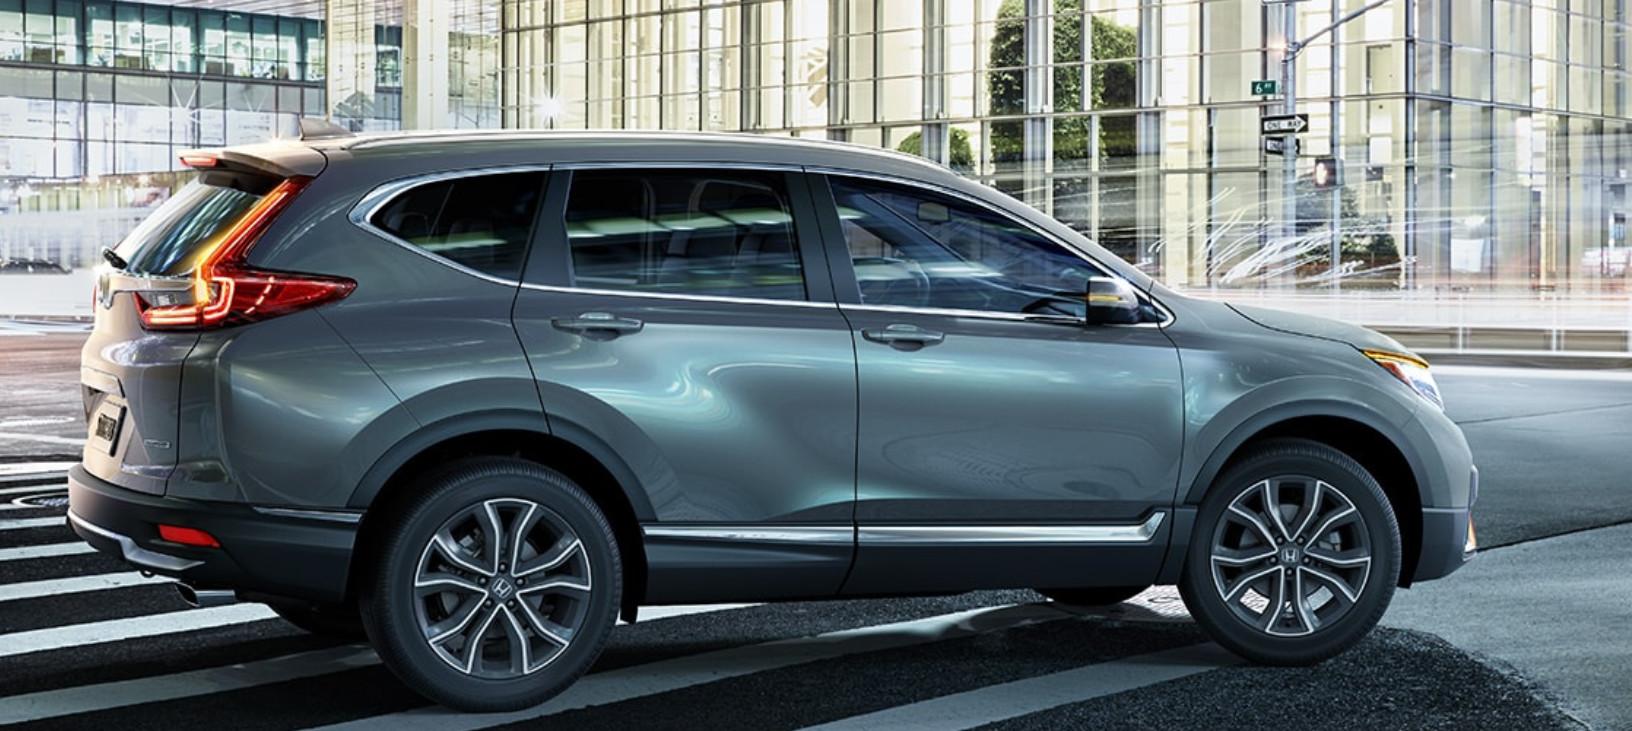 2020 Honda CR-V for Sale near Milford, DE